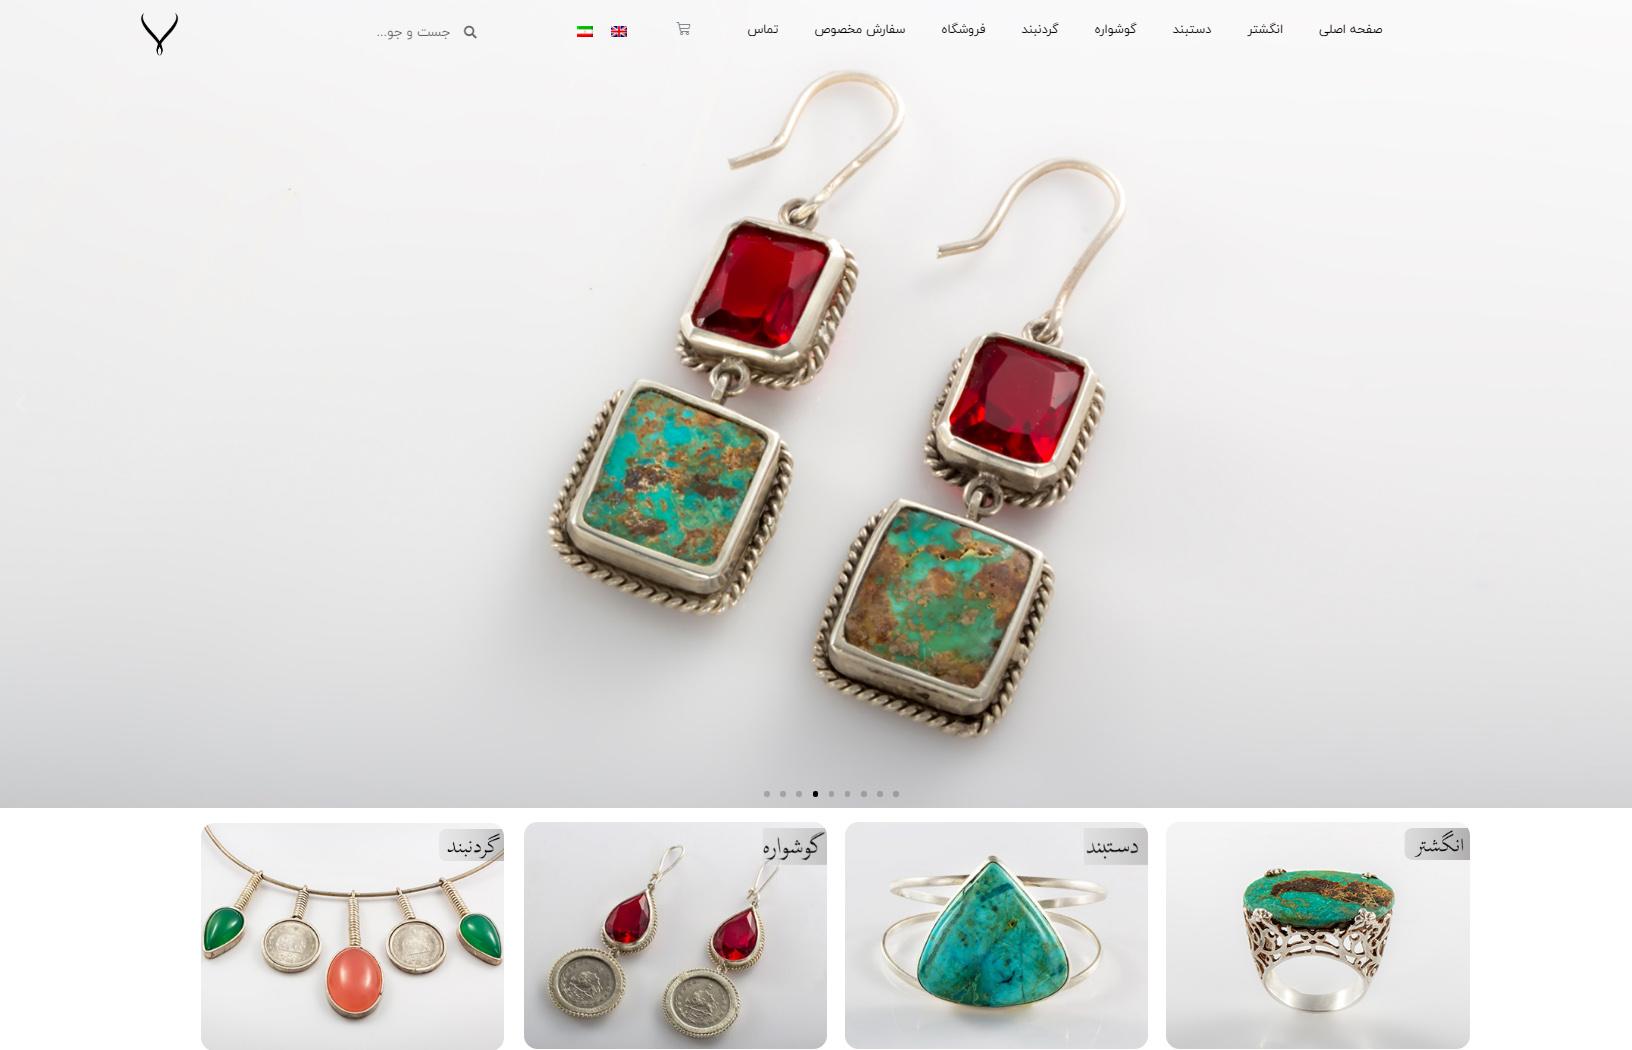 sanam - طراحی سایت